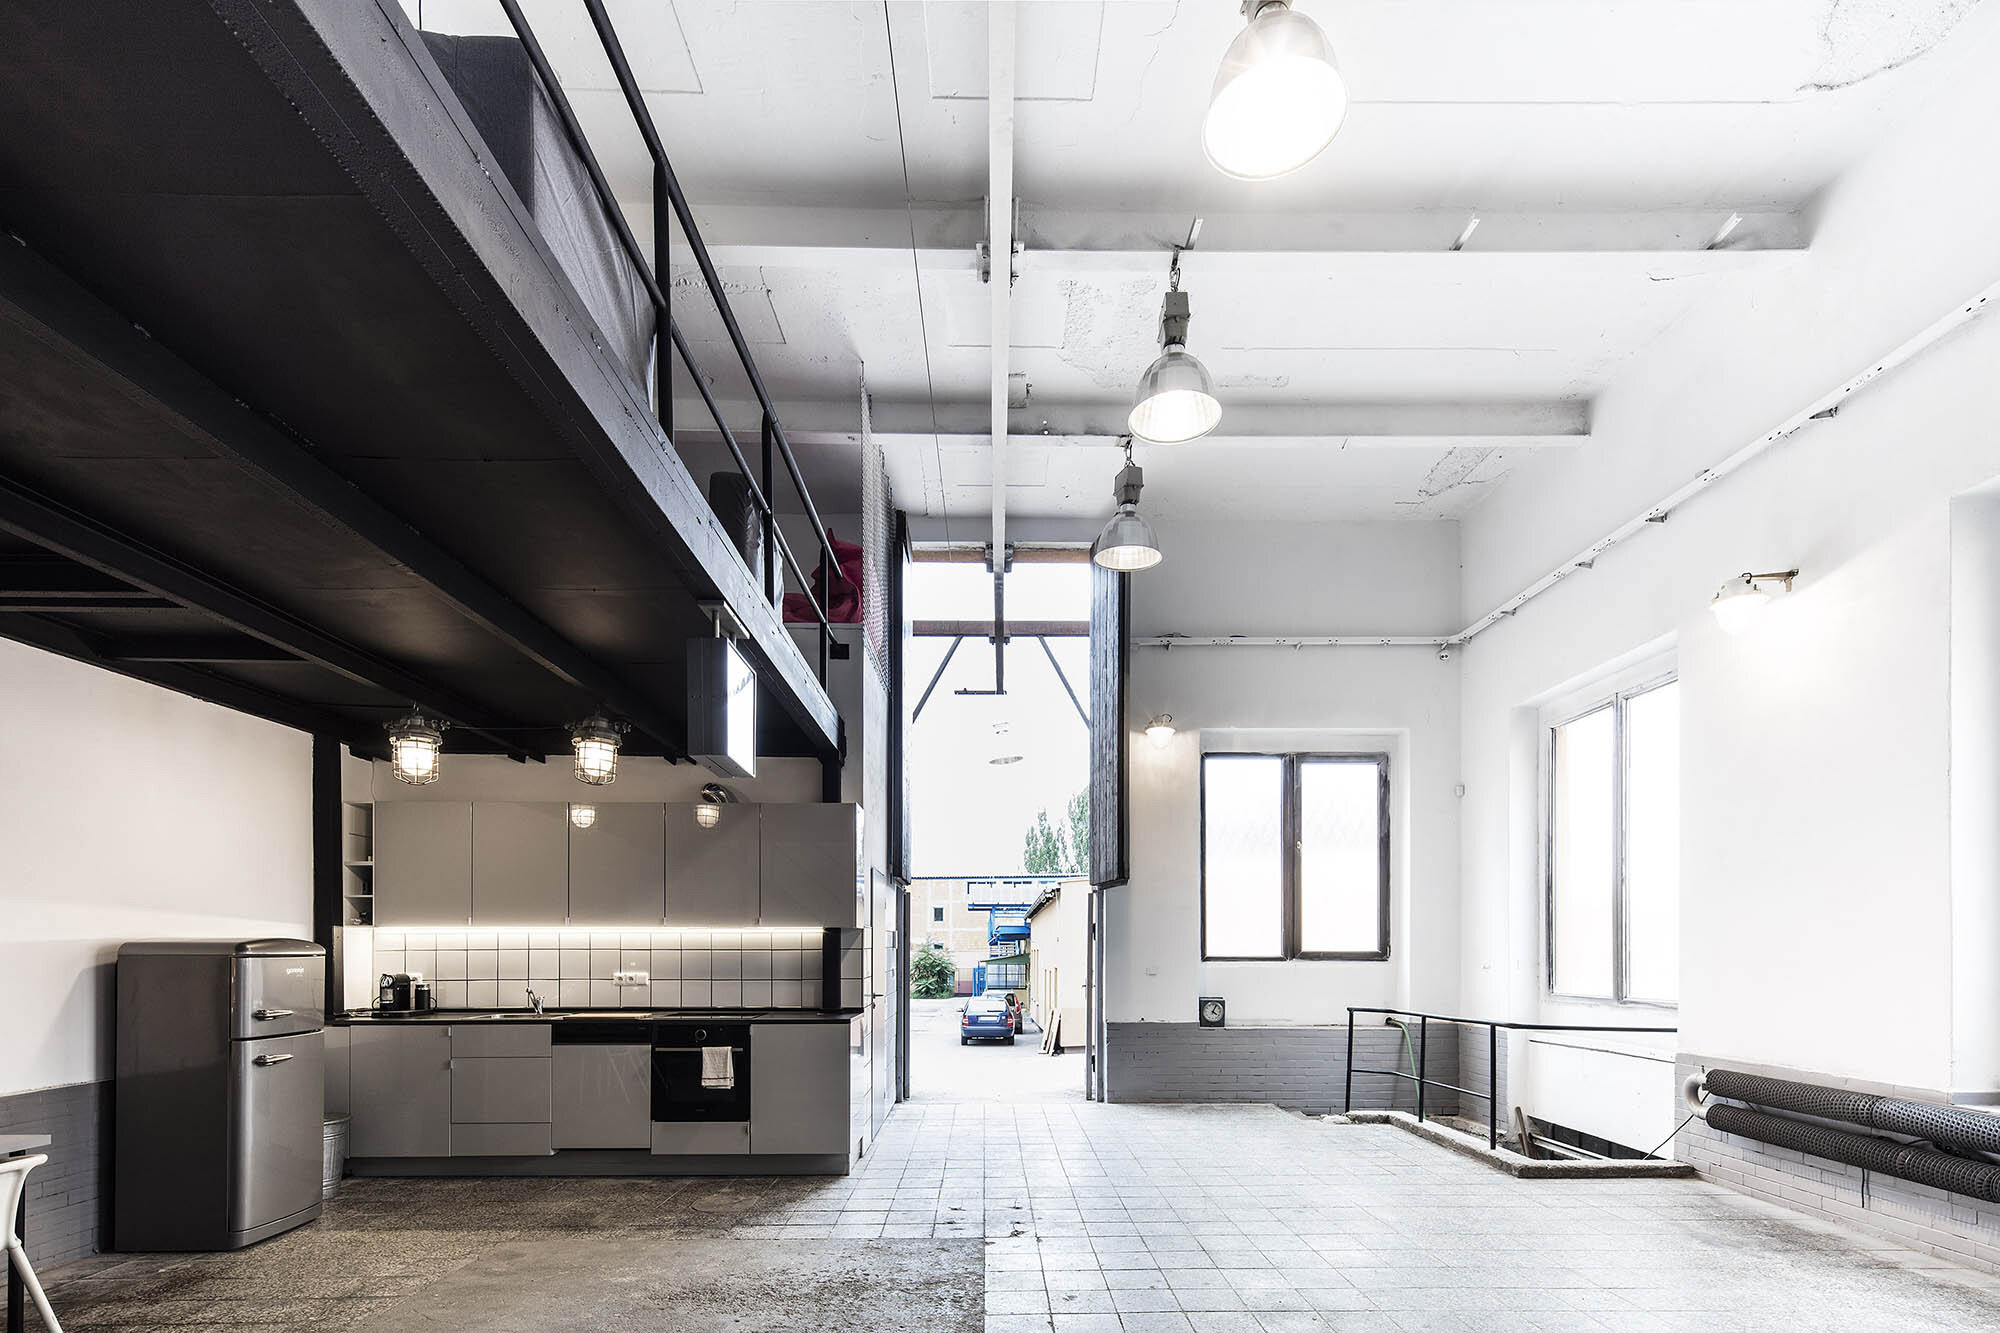 Studio Dvojka (1)-10.jpg